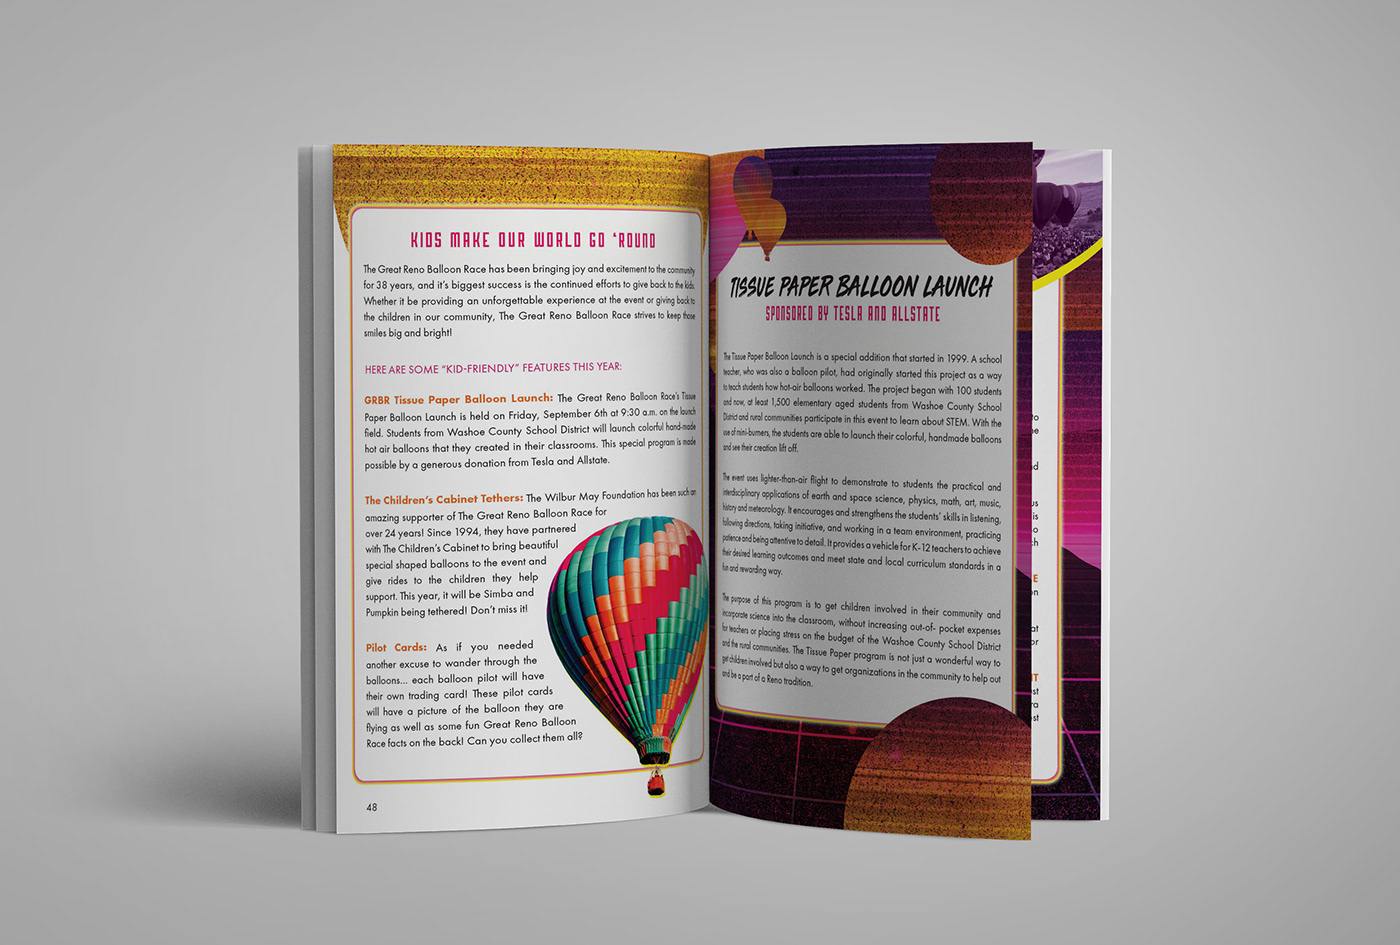 Image may contain: book, indoor and hot air balloon